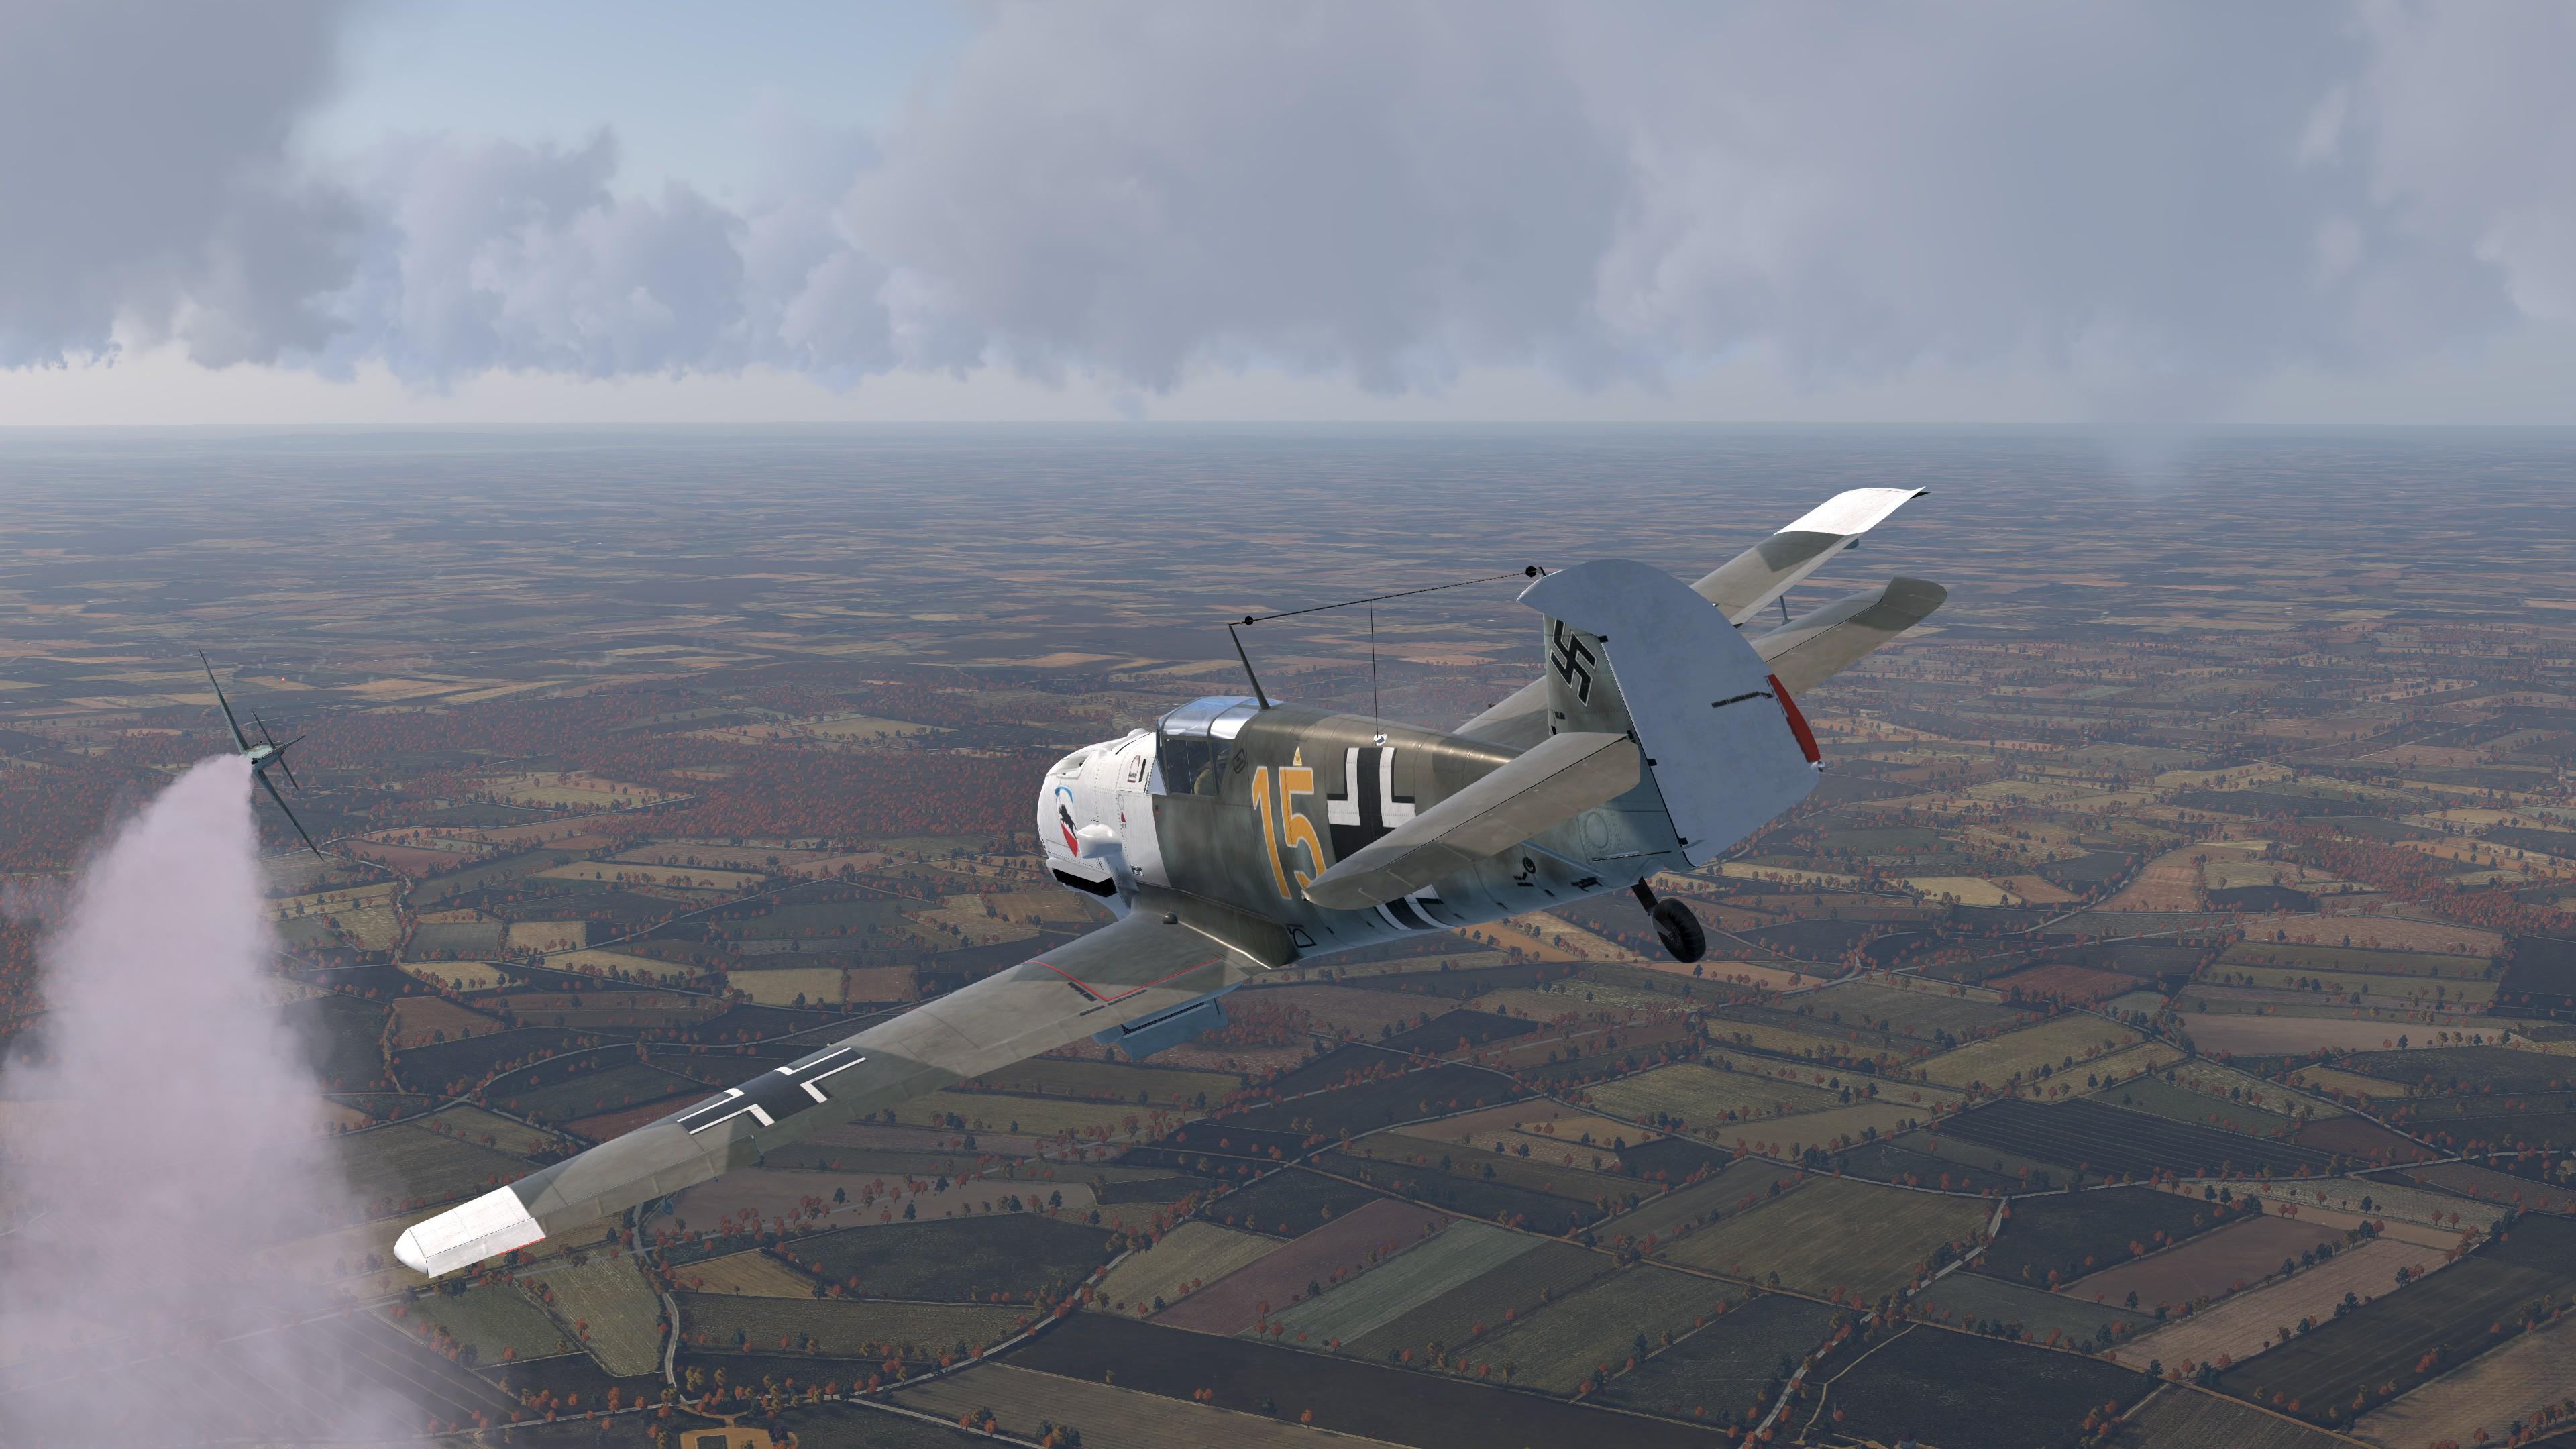 COD CF Bf 109E3 3.JG52 Yellow 15 Kurt Wolff France 1940 V03